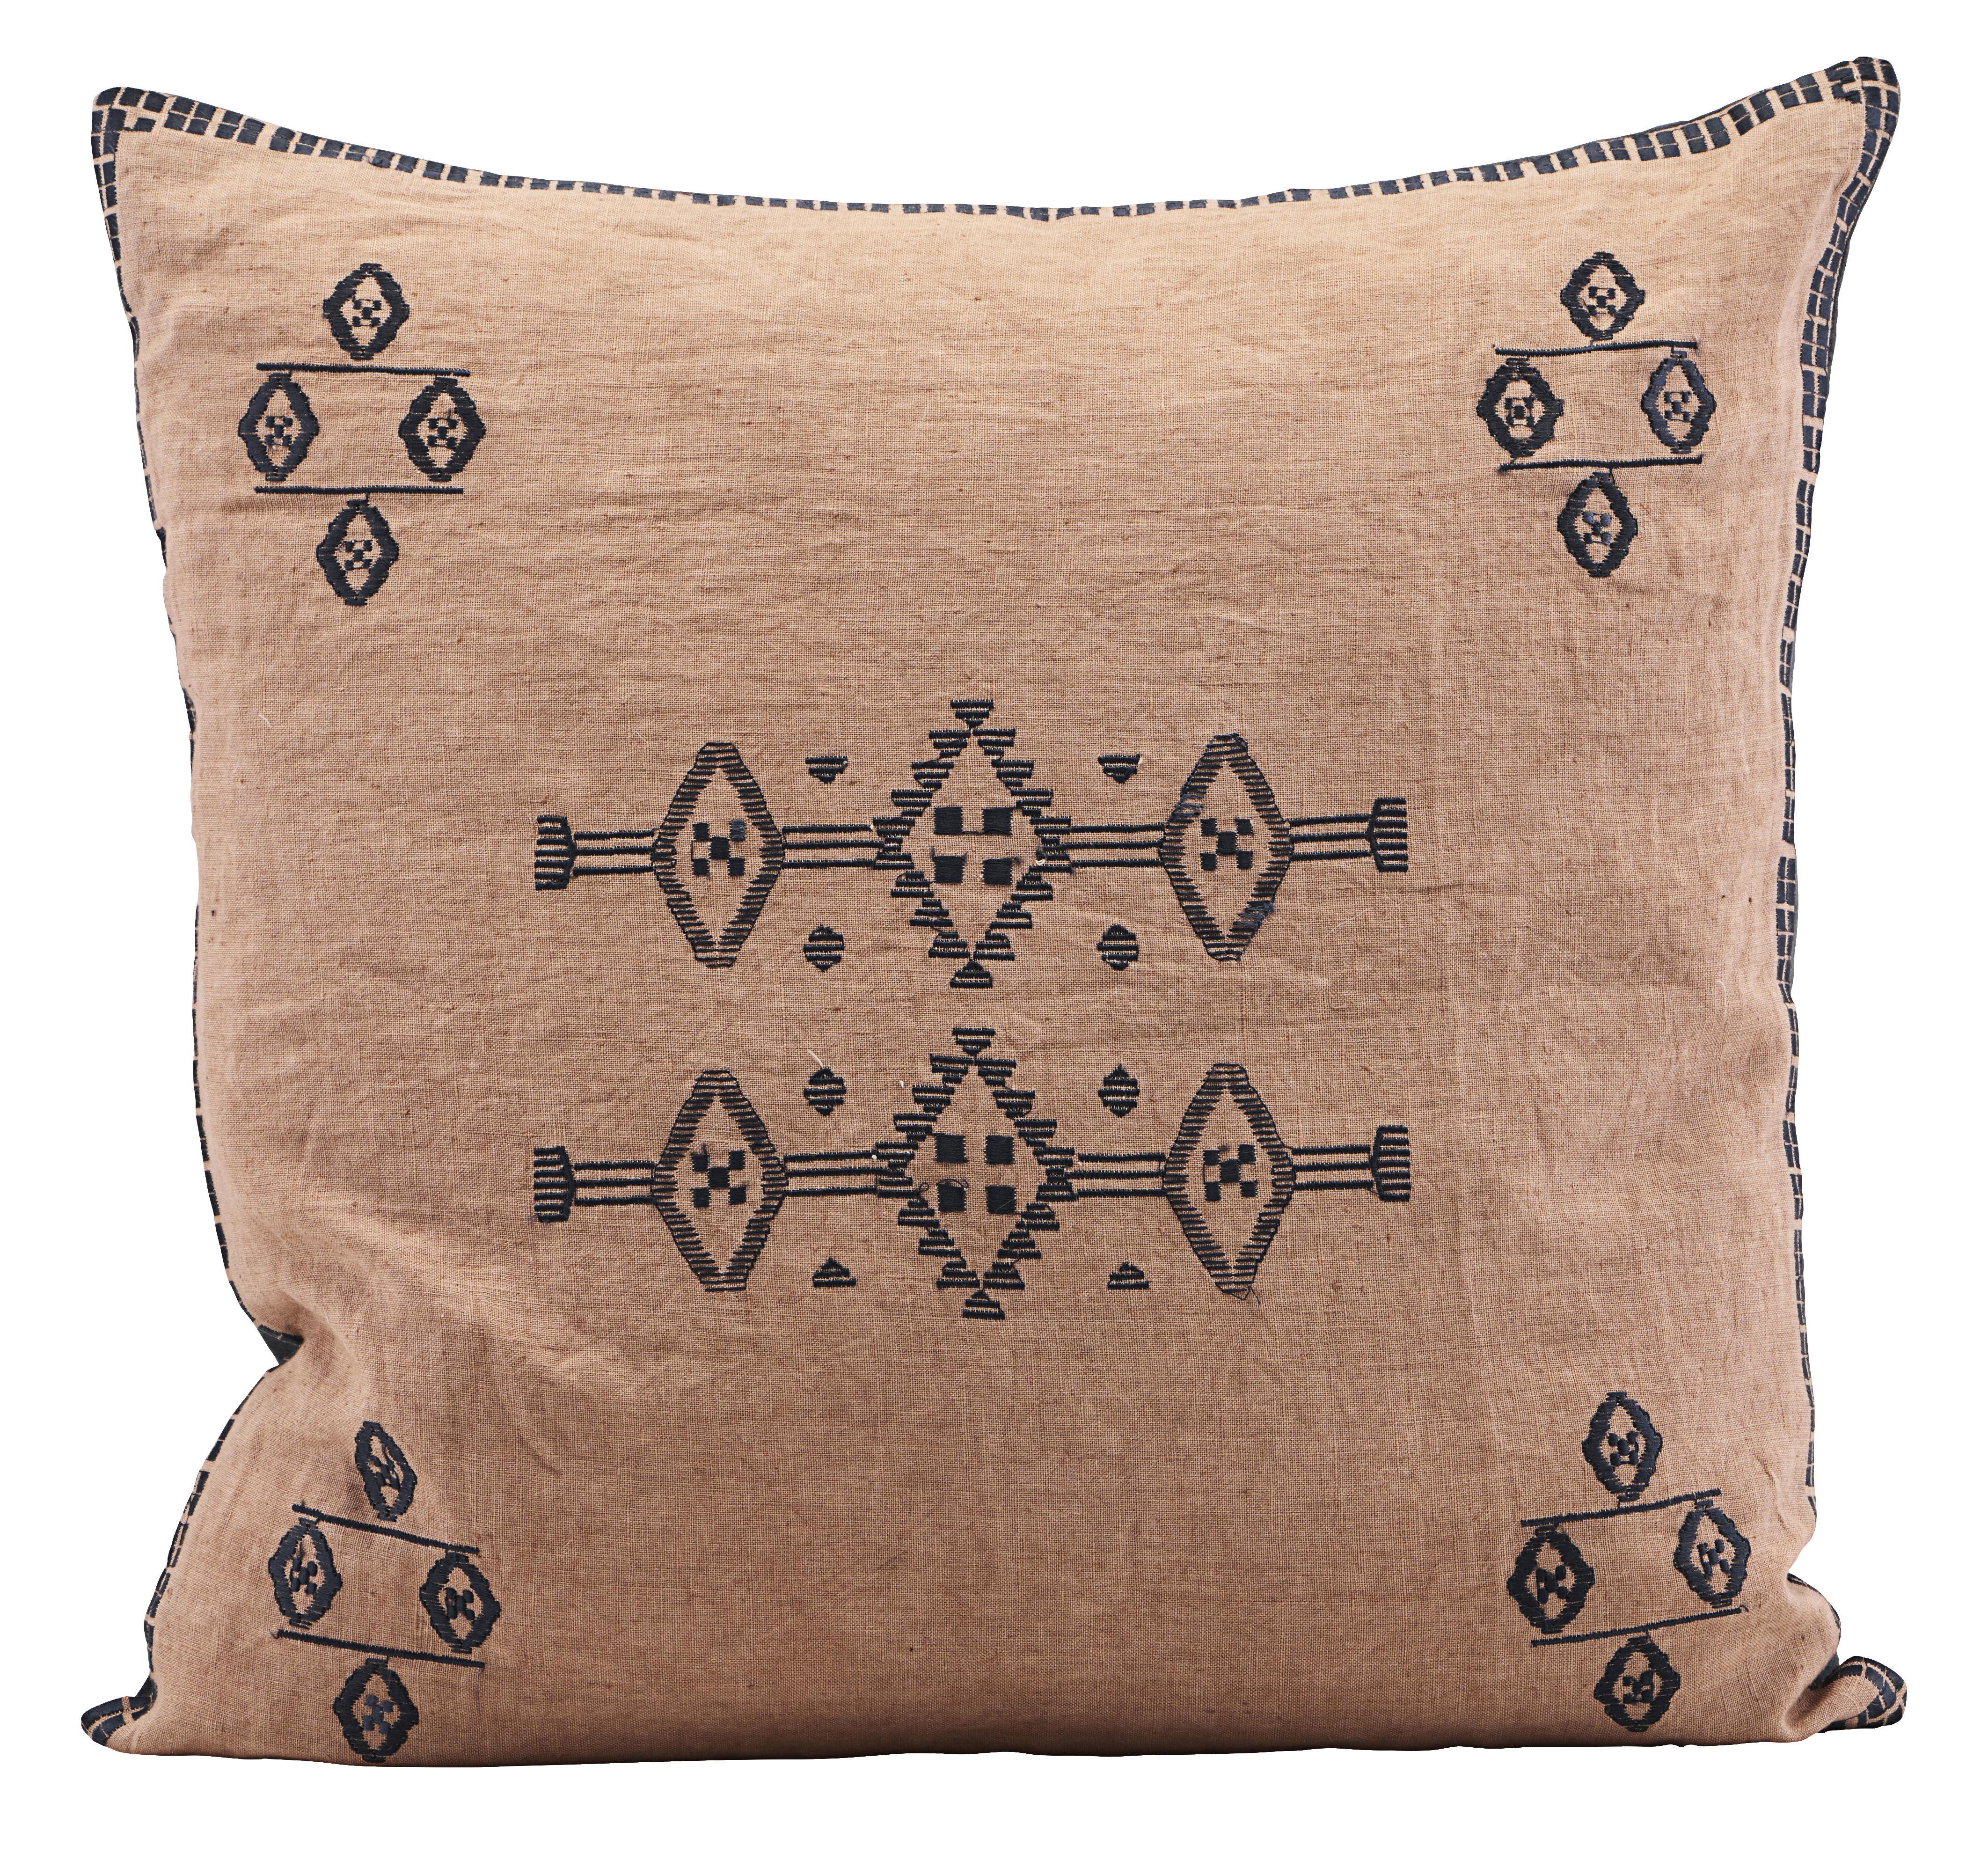 inka kissen leinen 50 x 50 cm hautfarben by house doctor made in design. Black Bedroom Furniture Sets. Home Design Ideas